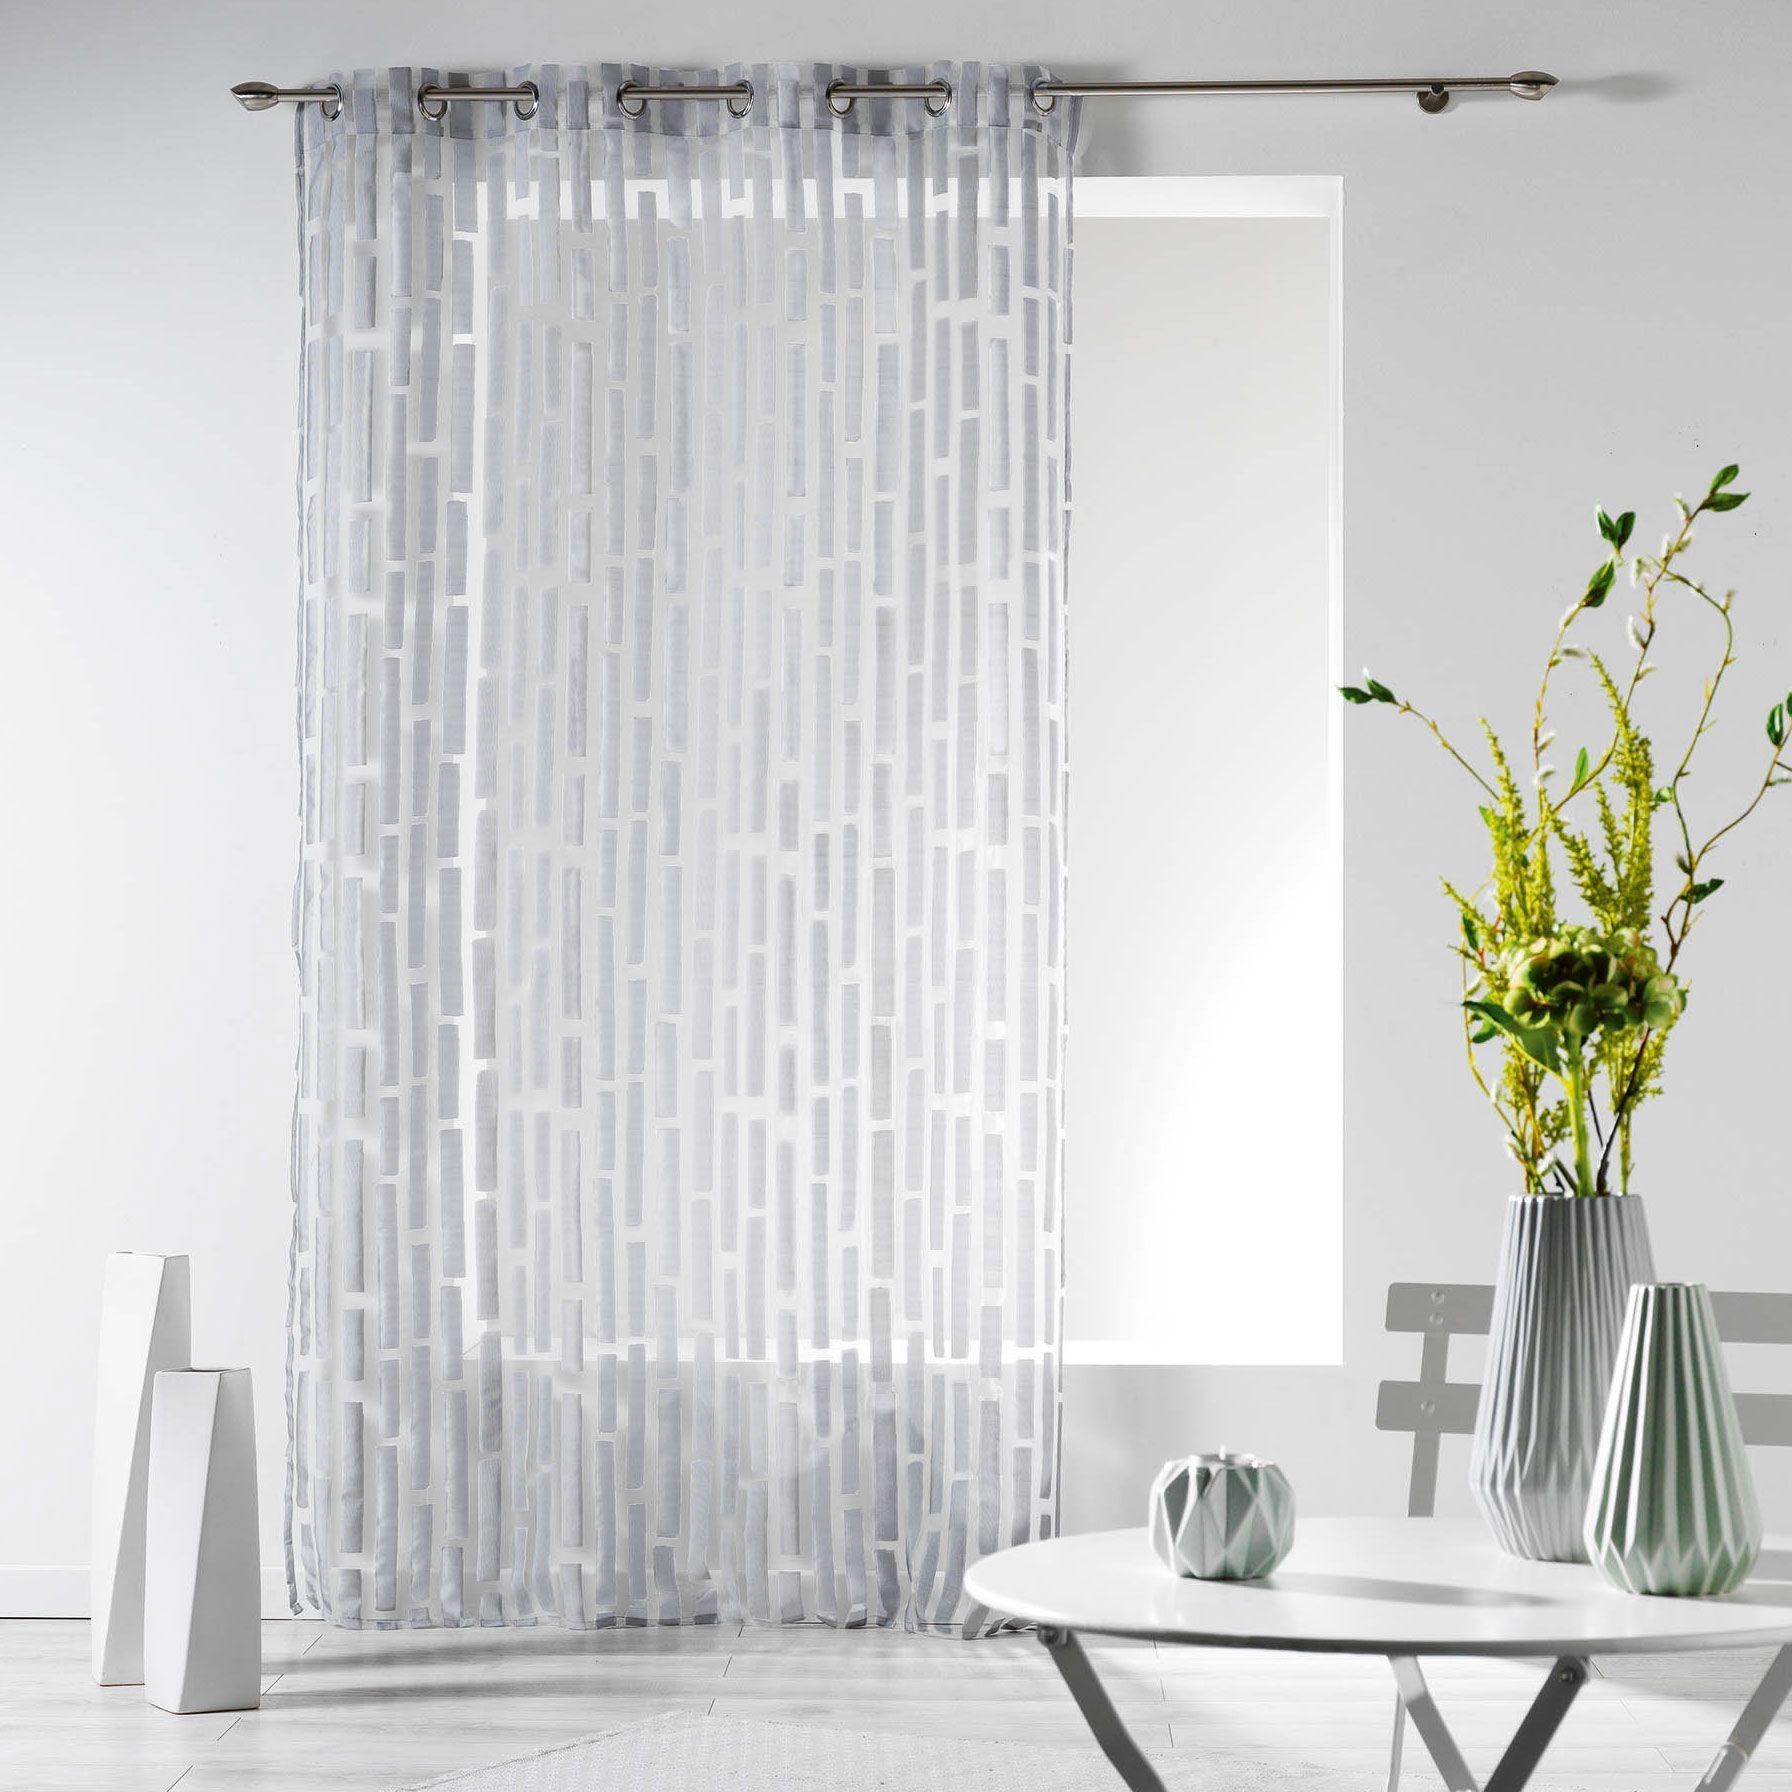 Rideau tamisant 140 x 240 cm organza elytis gris - Maison elytis ...